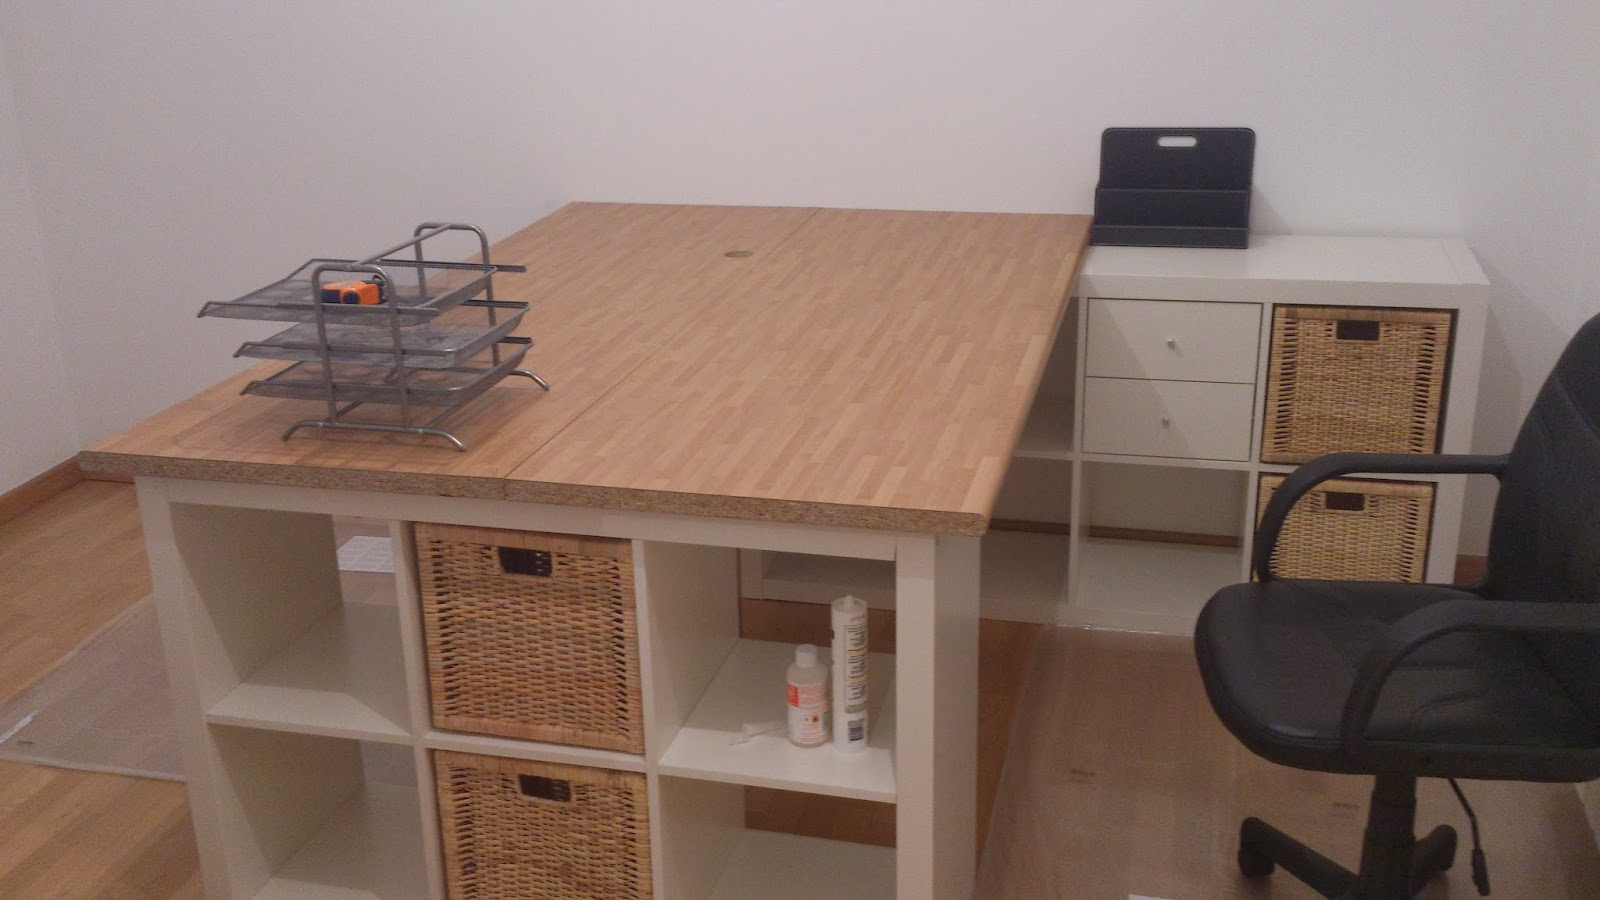 Mesas Despacho Ikea Budm Mesa De Despacho Ikea Ikea Despachos Magnfico Ideas Decoracin